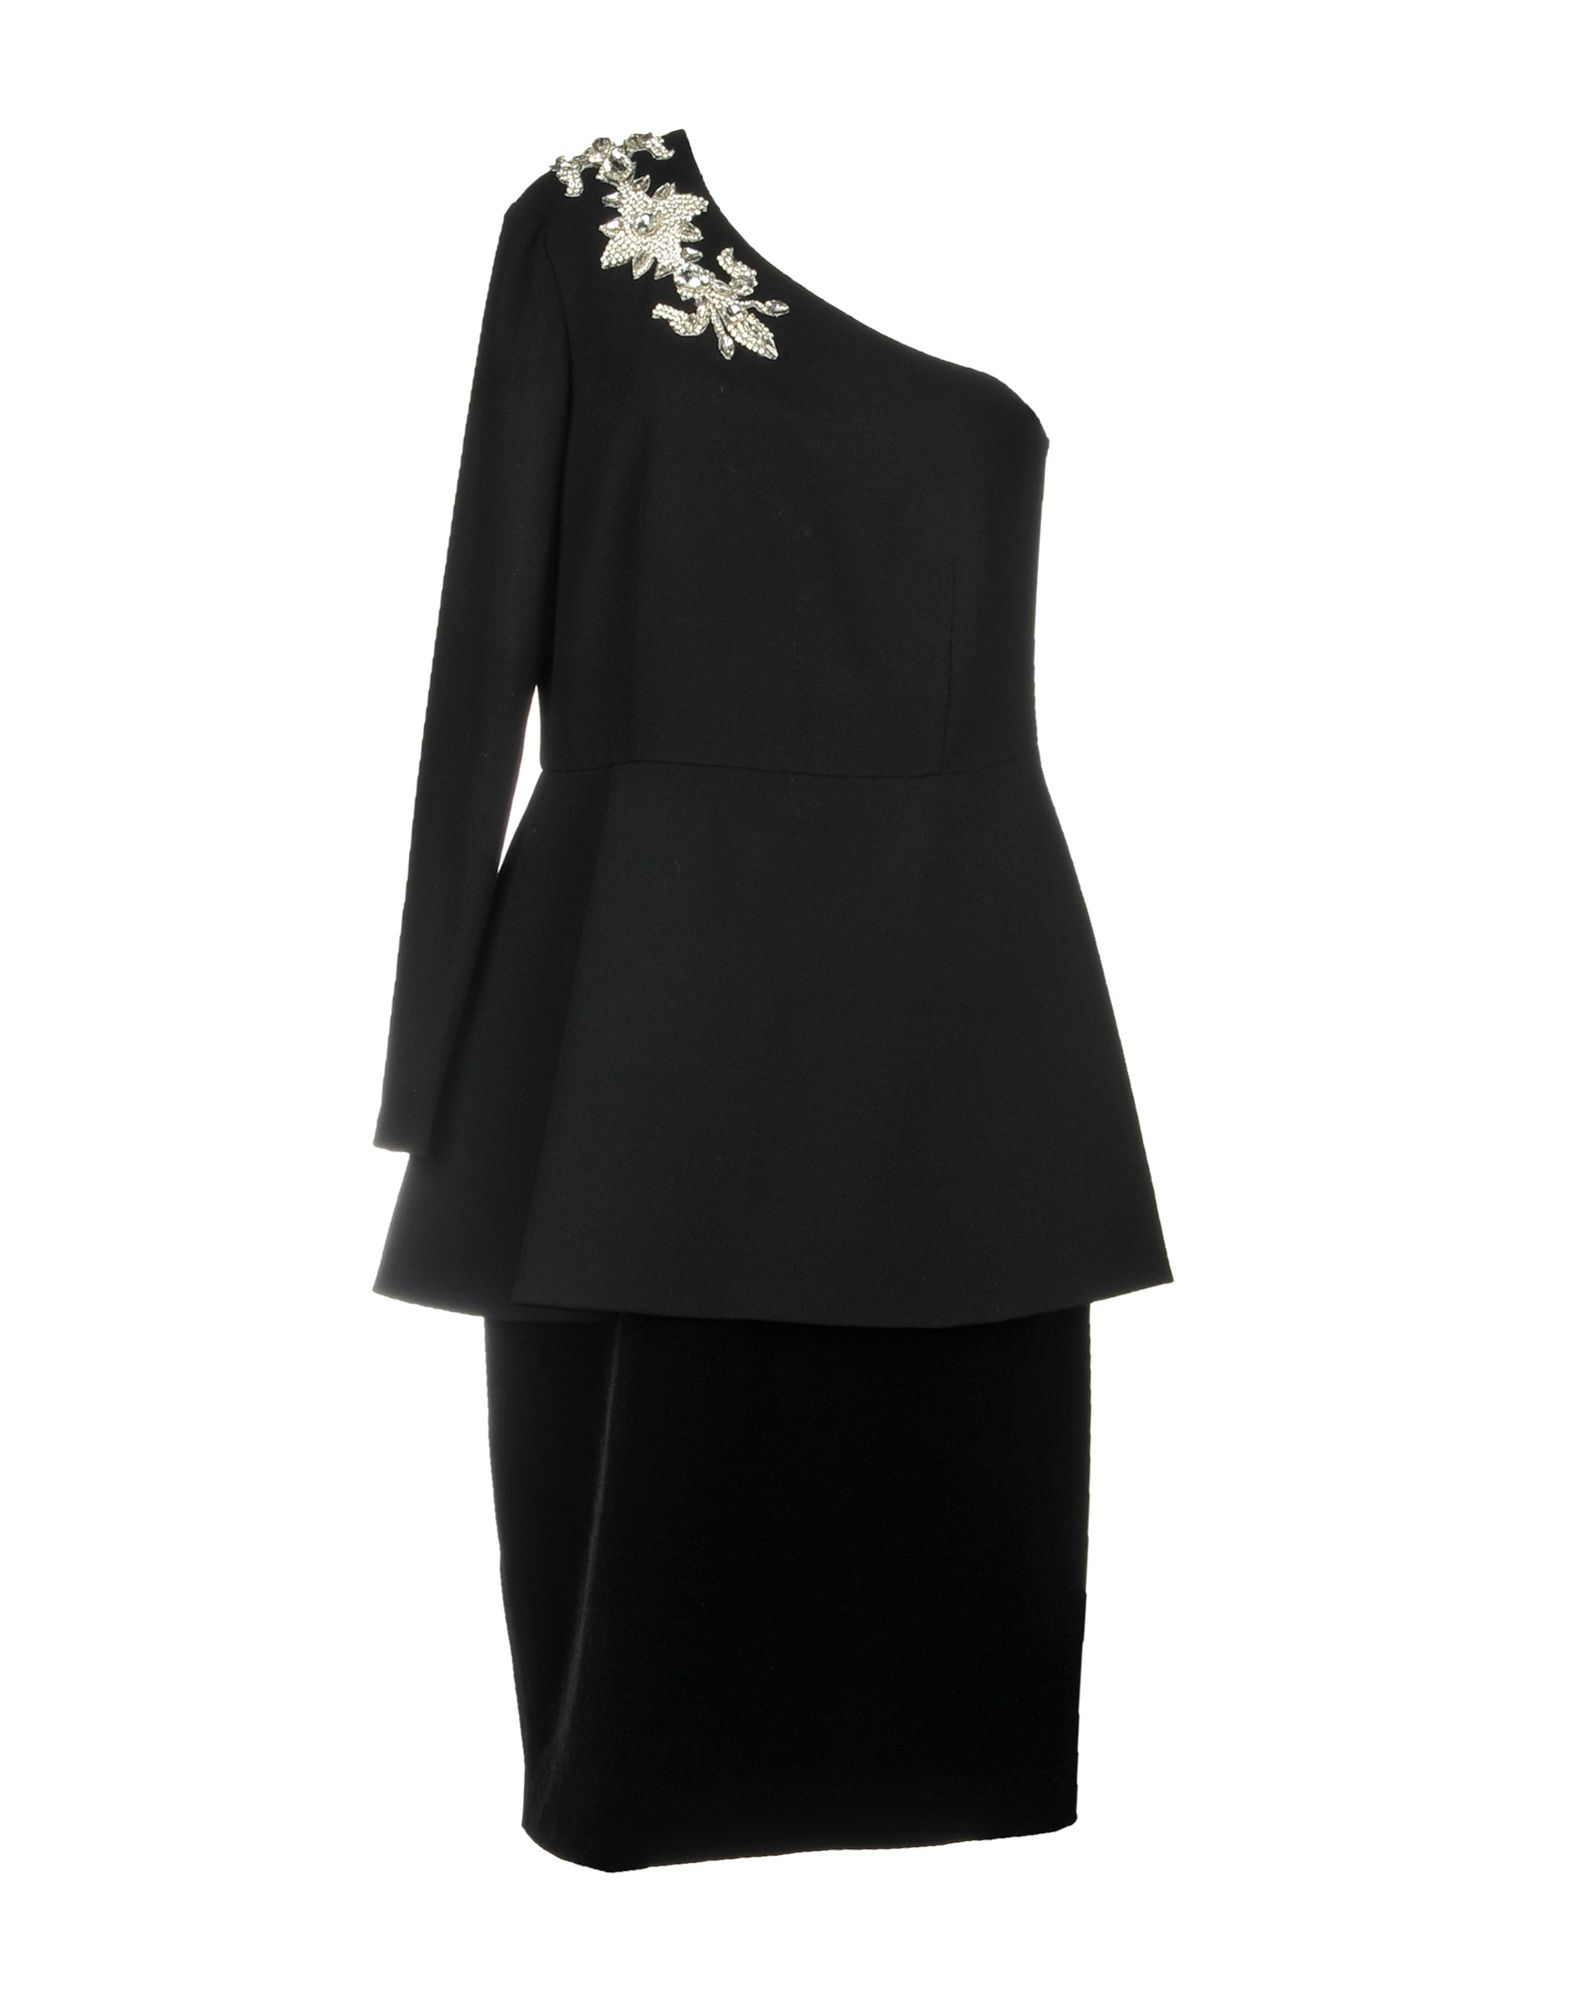 STEFANO DE LELLIS Knee-Length Dresses in Black